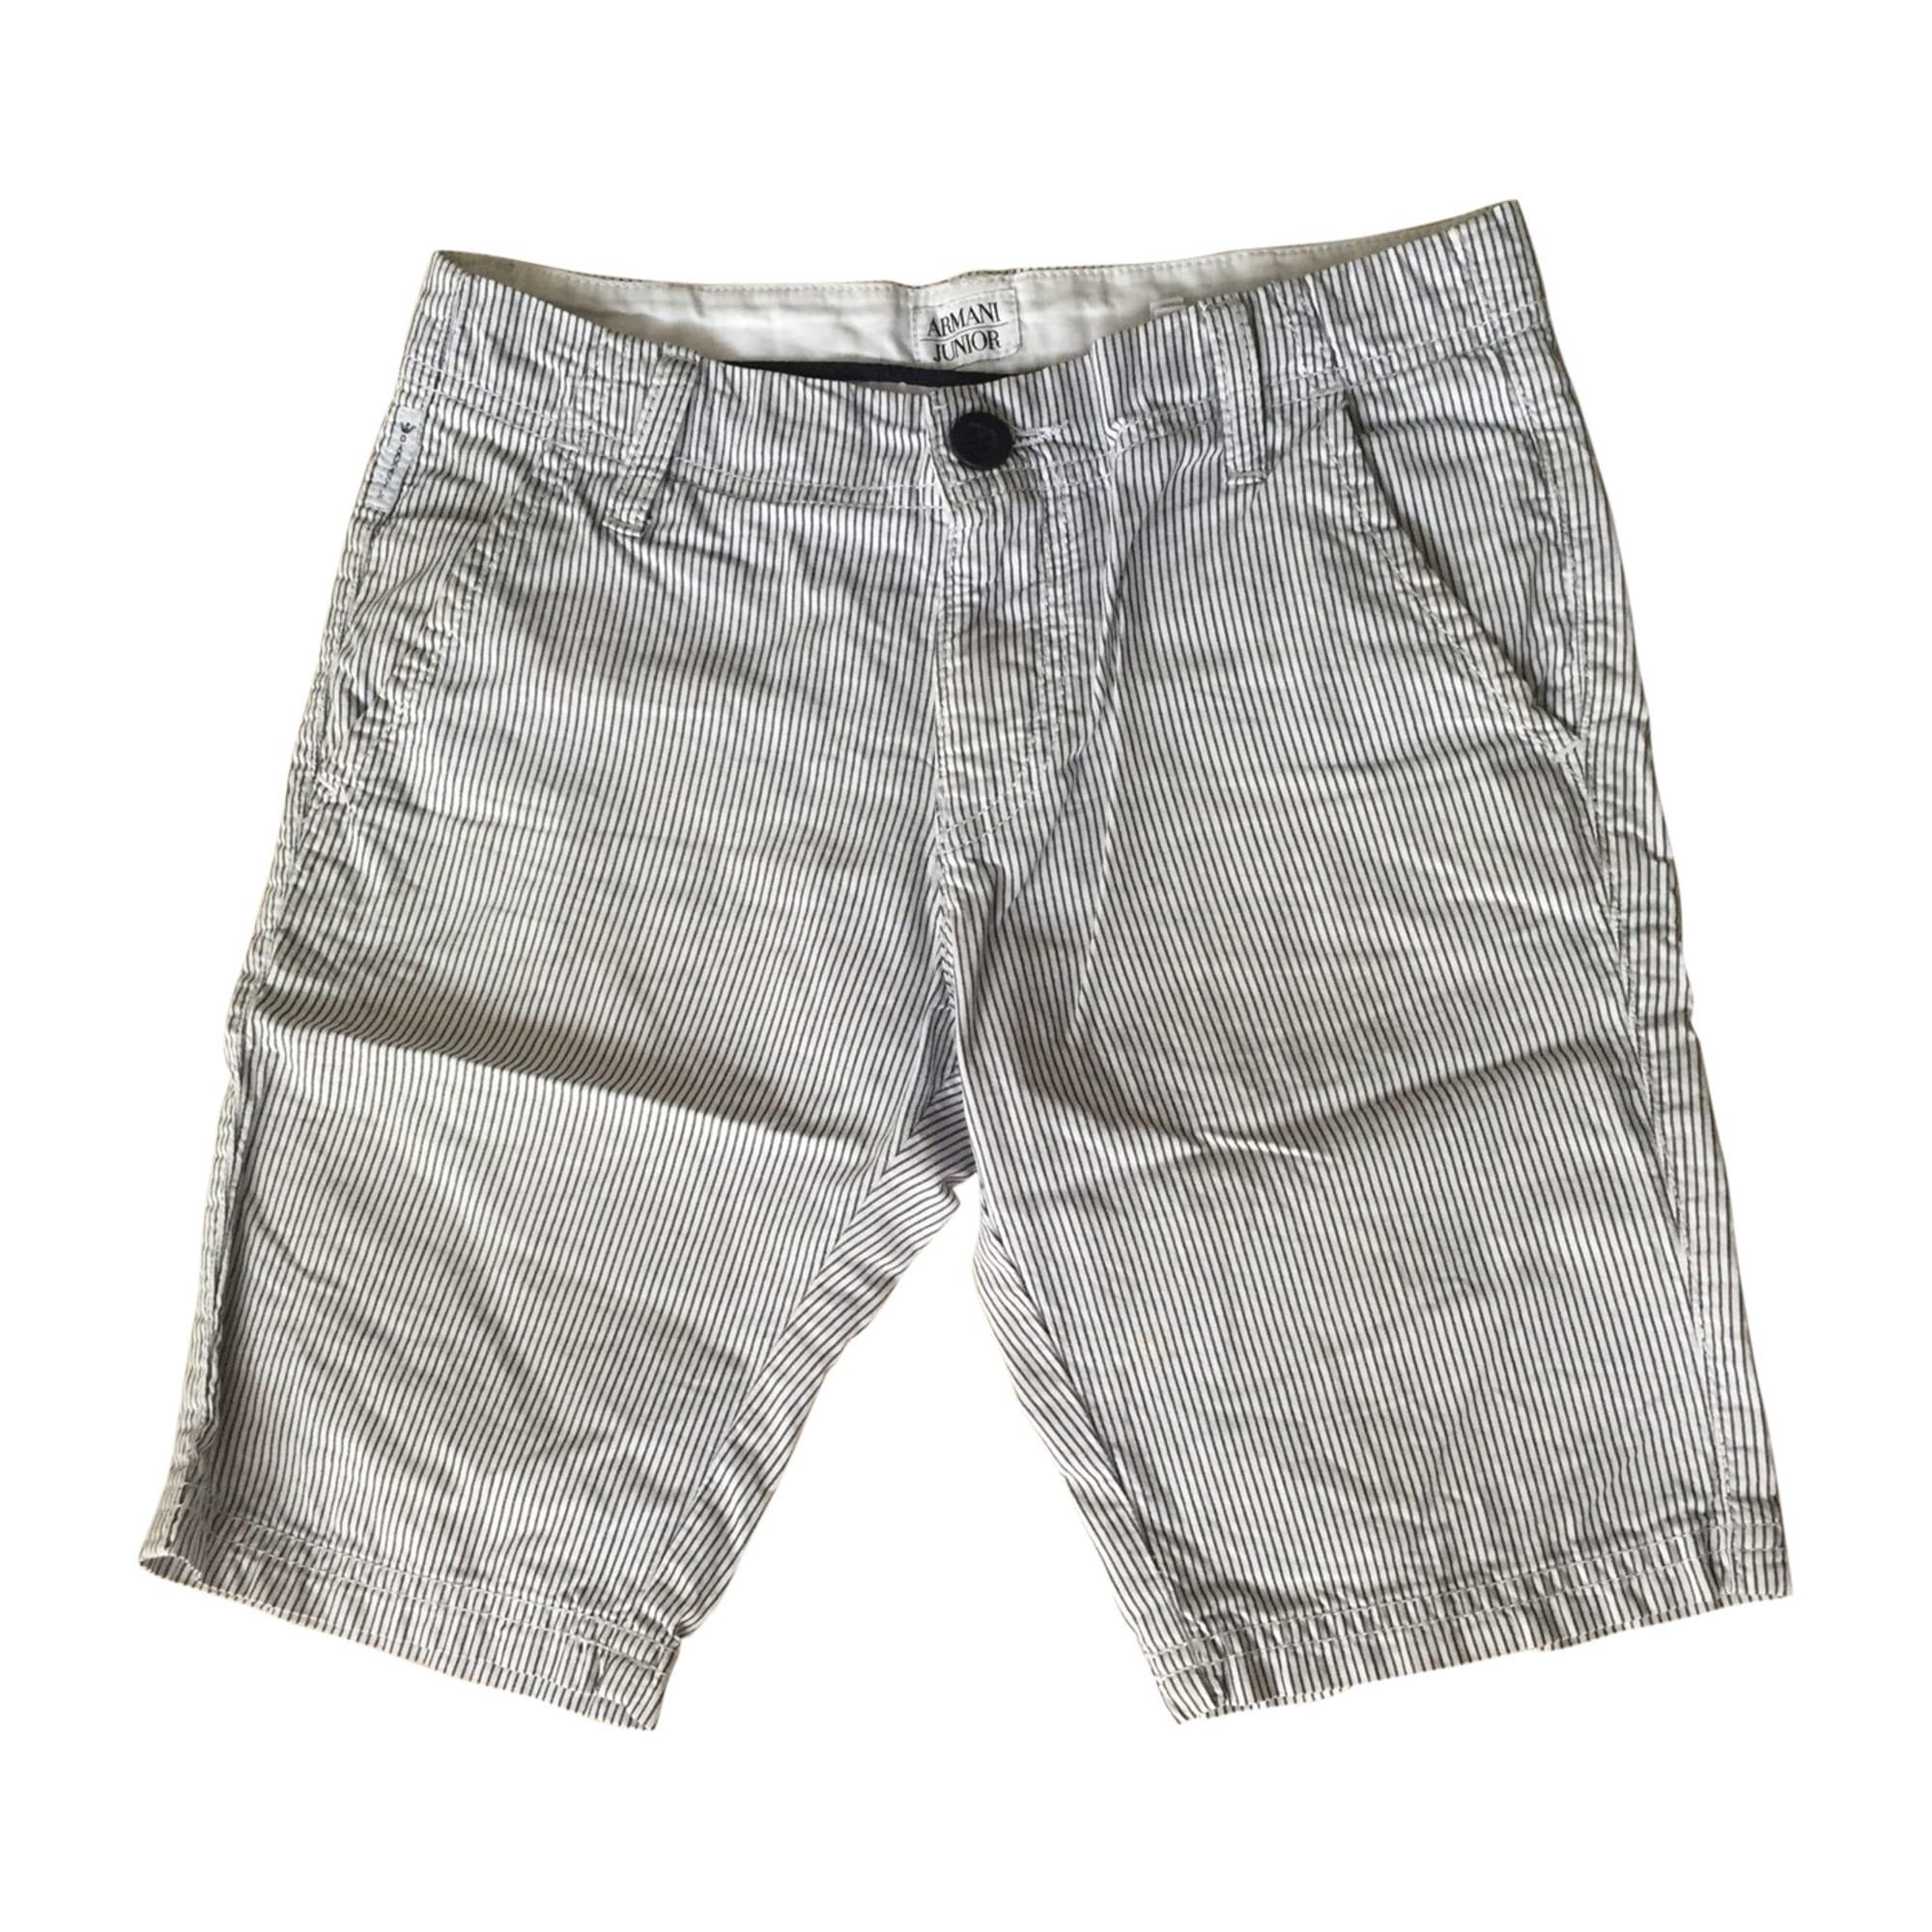 Bermuda Shorts ARMANI White, off-white, ecru